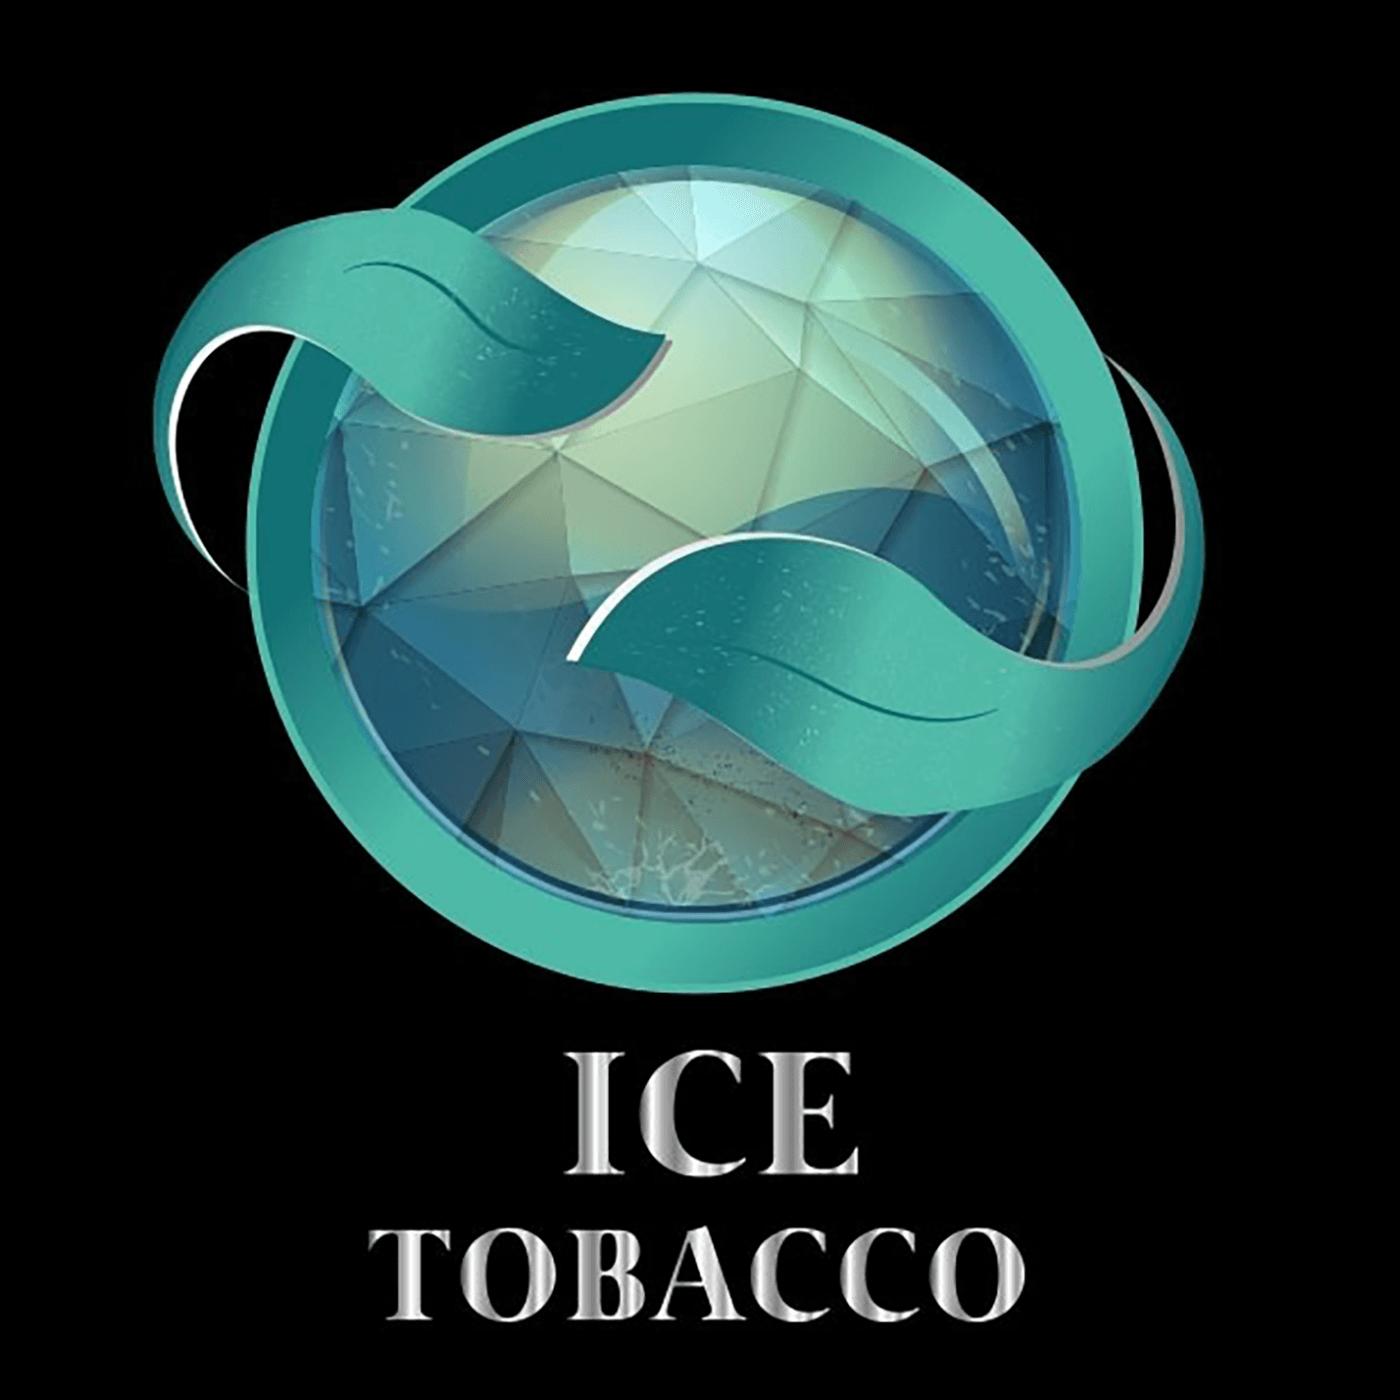 Tekućina za e-cigarete, Ice Tobacco Premium 30ml, 4.5mg